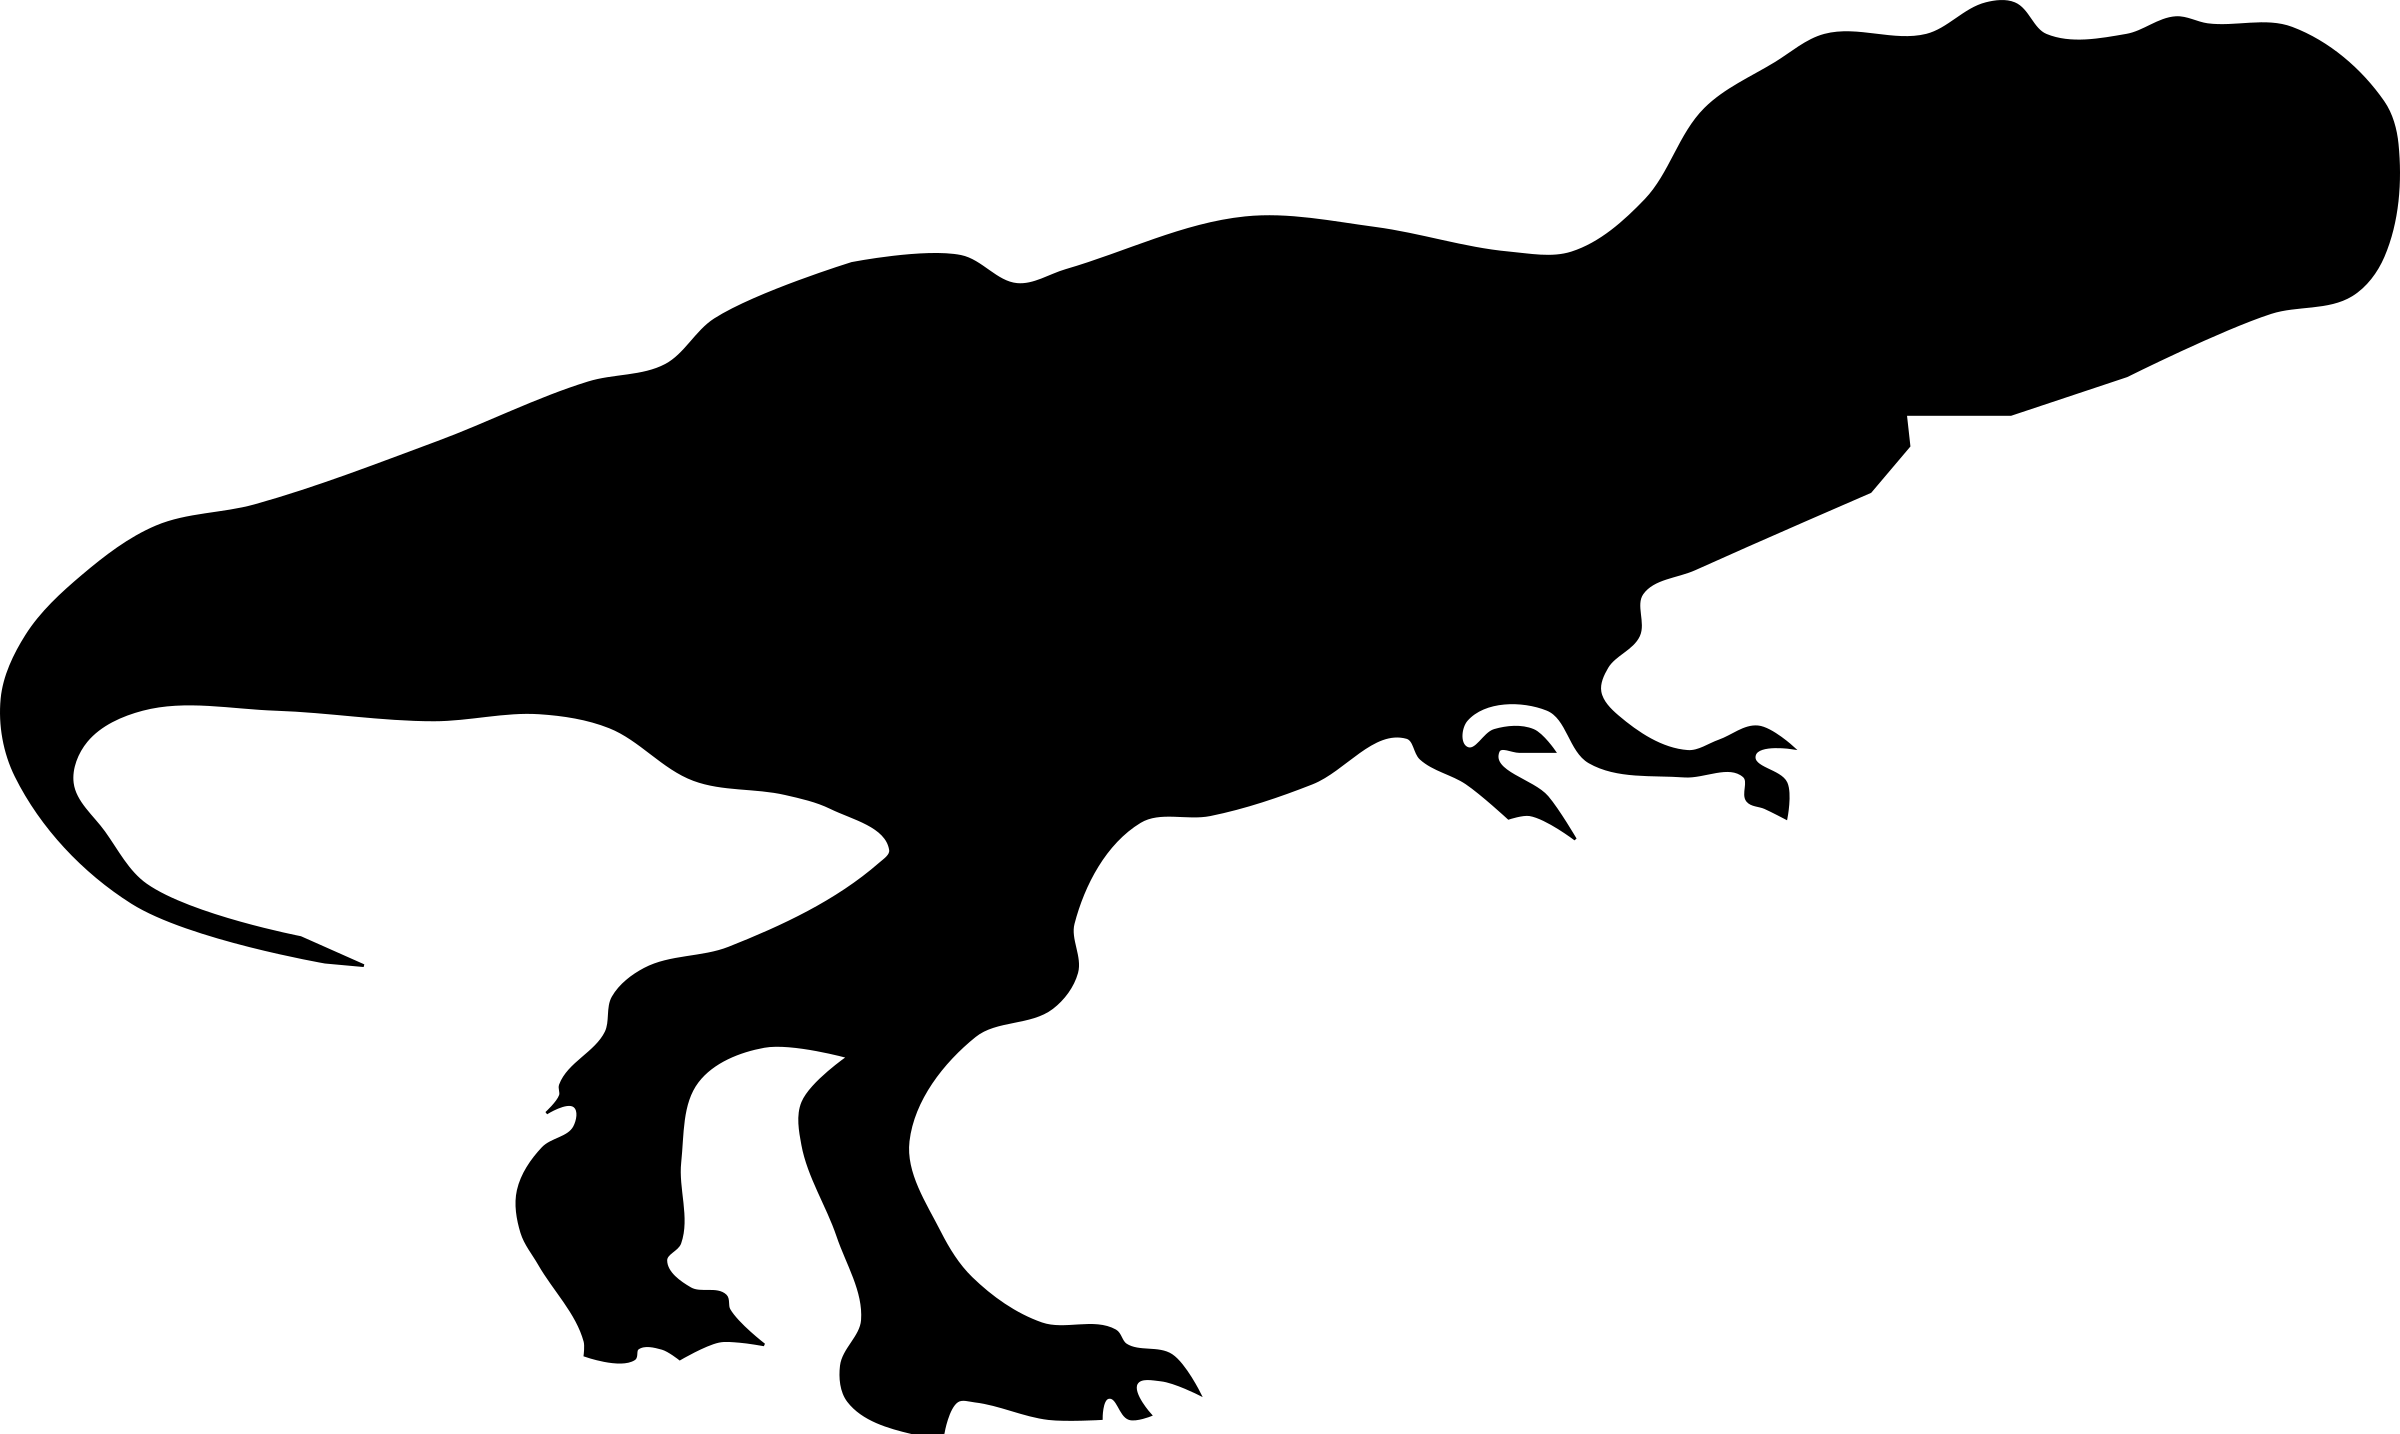 T silhouette at getdrawings. Dinosaur clipart tyrannosaurus rex